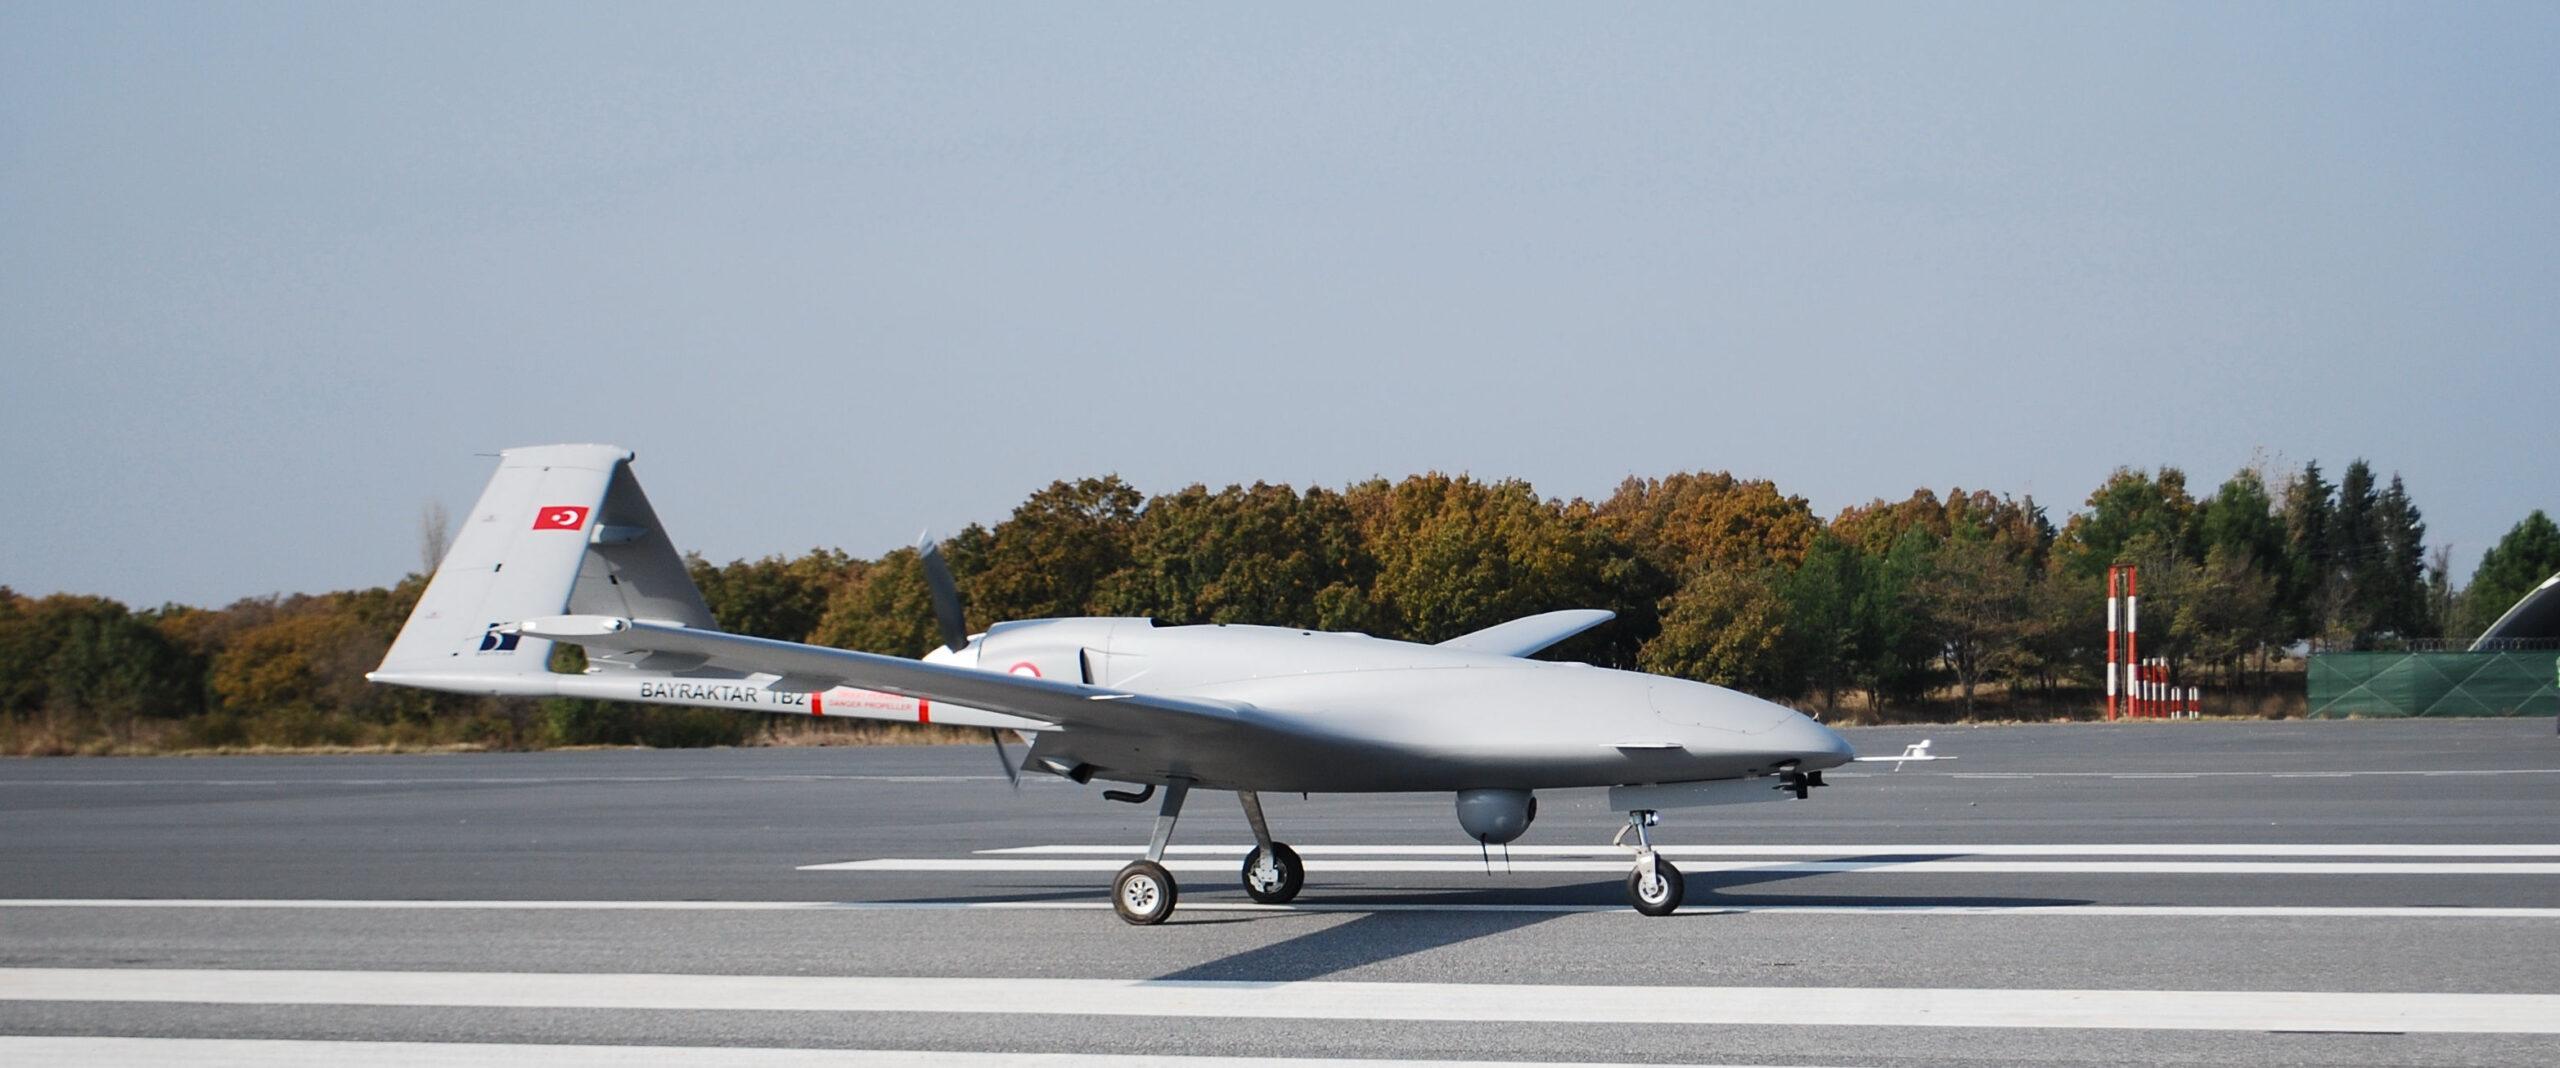 How Drone Warfare Tilt Battle with Armenia in Favour of Azerbaijan